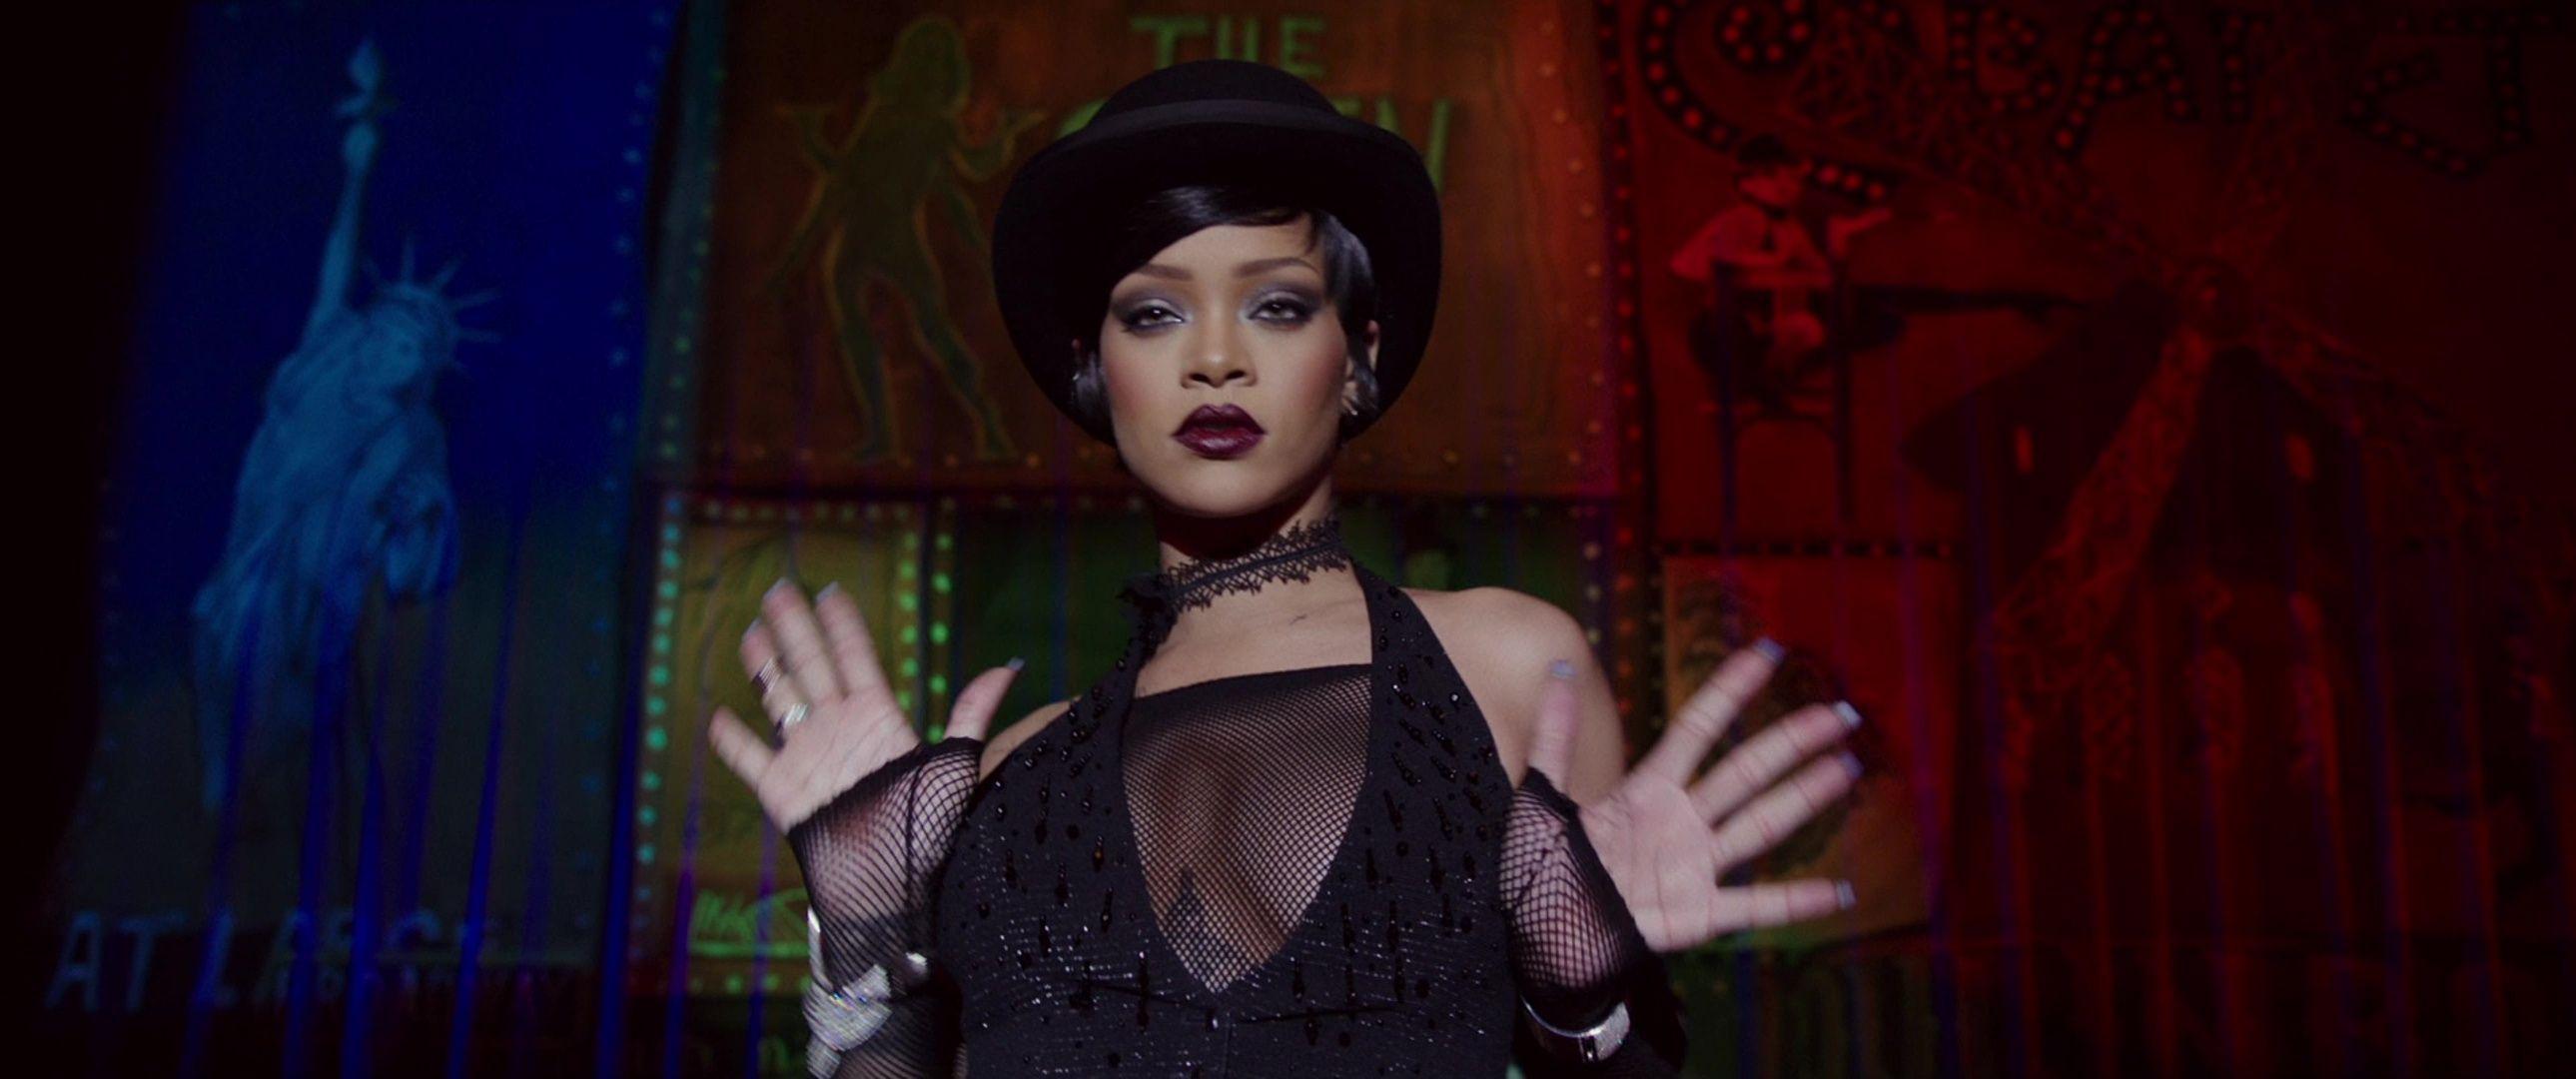 Rihanna-Sexy-4-thefappeningblog.com_.jpg